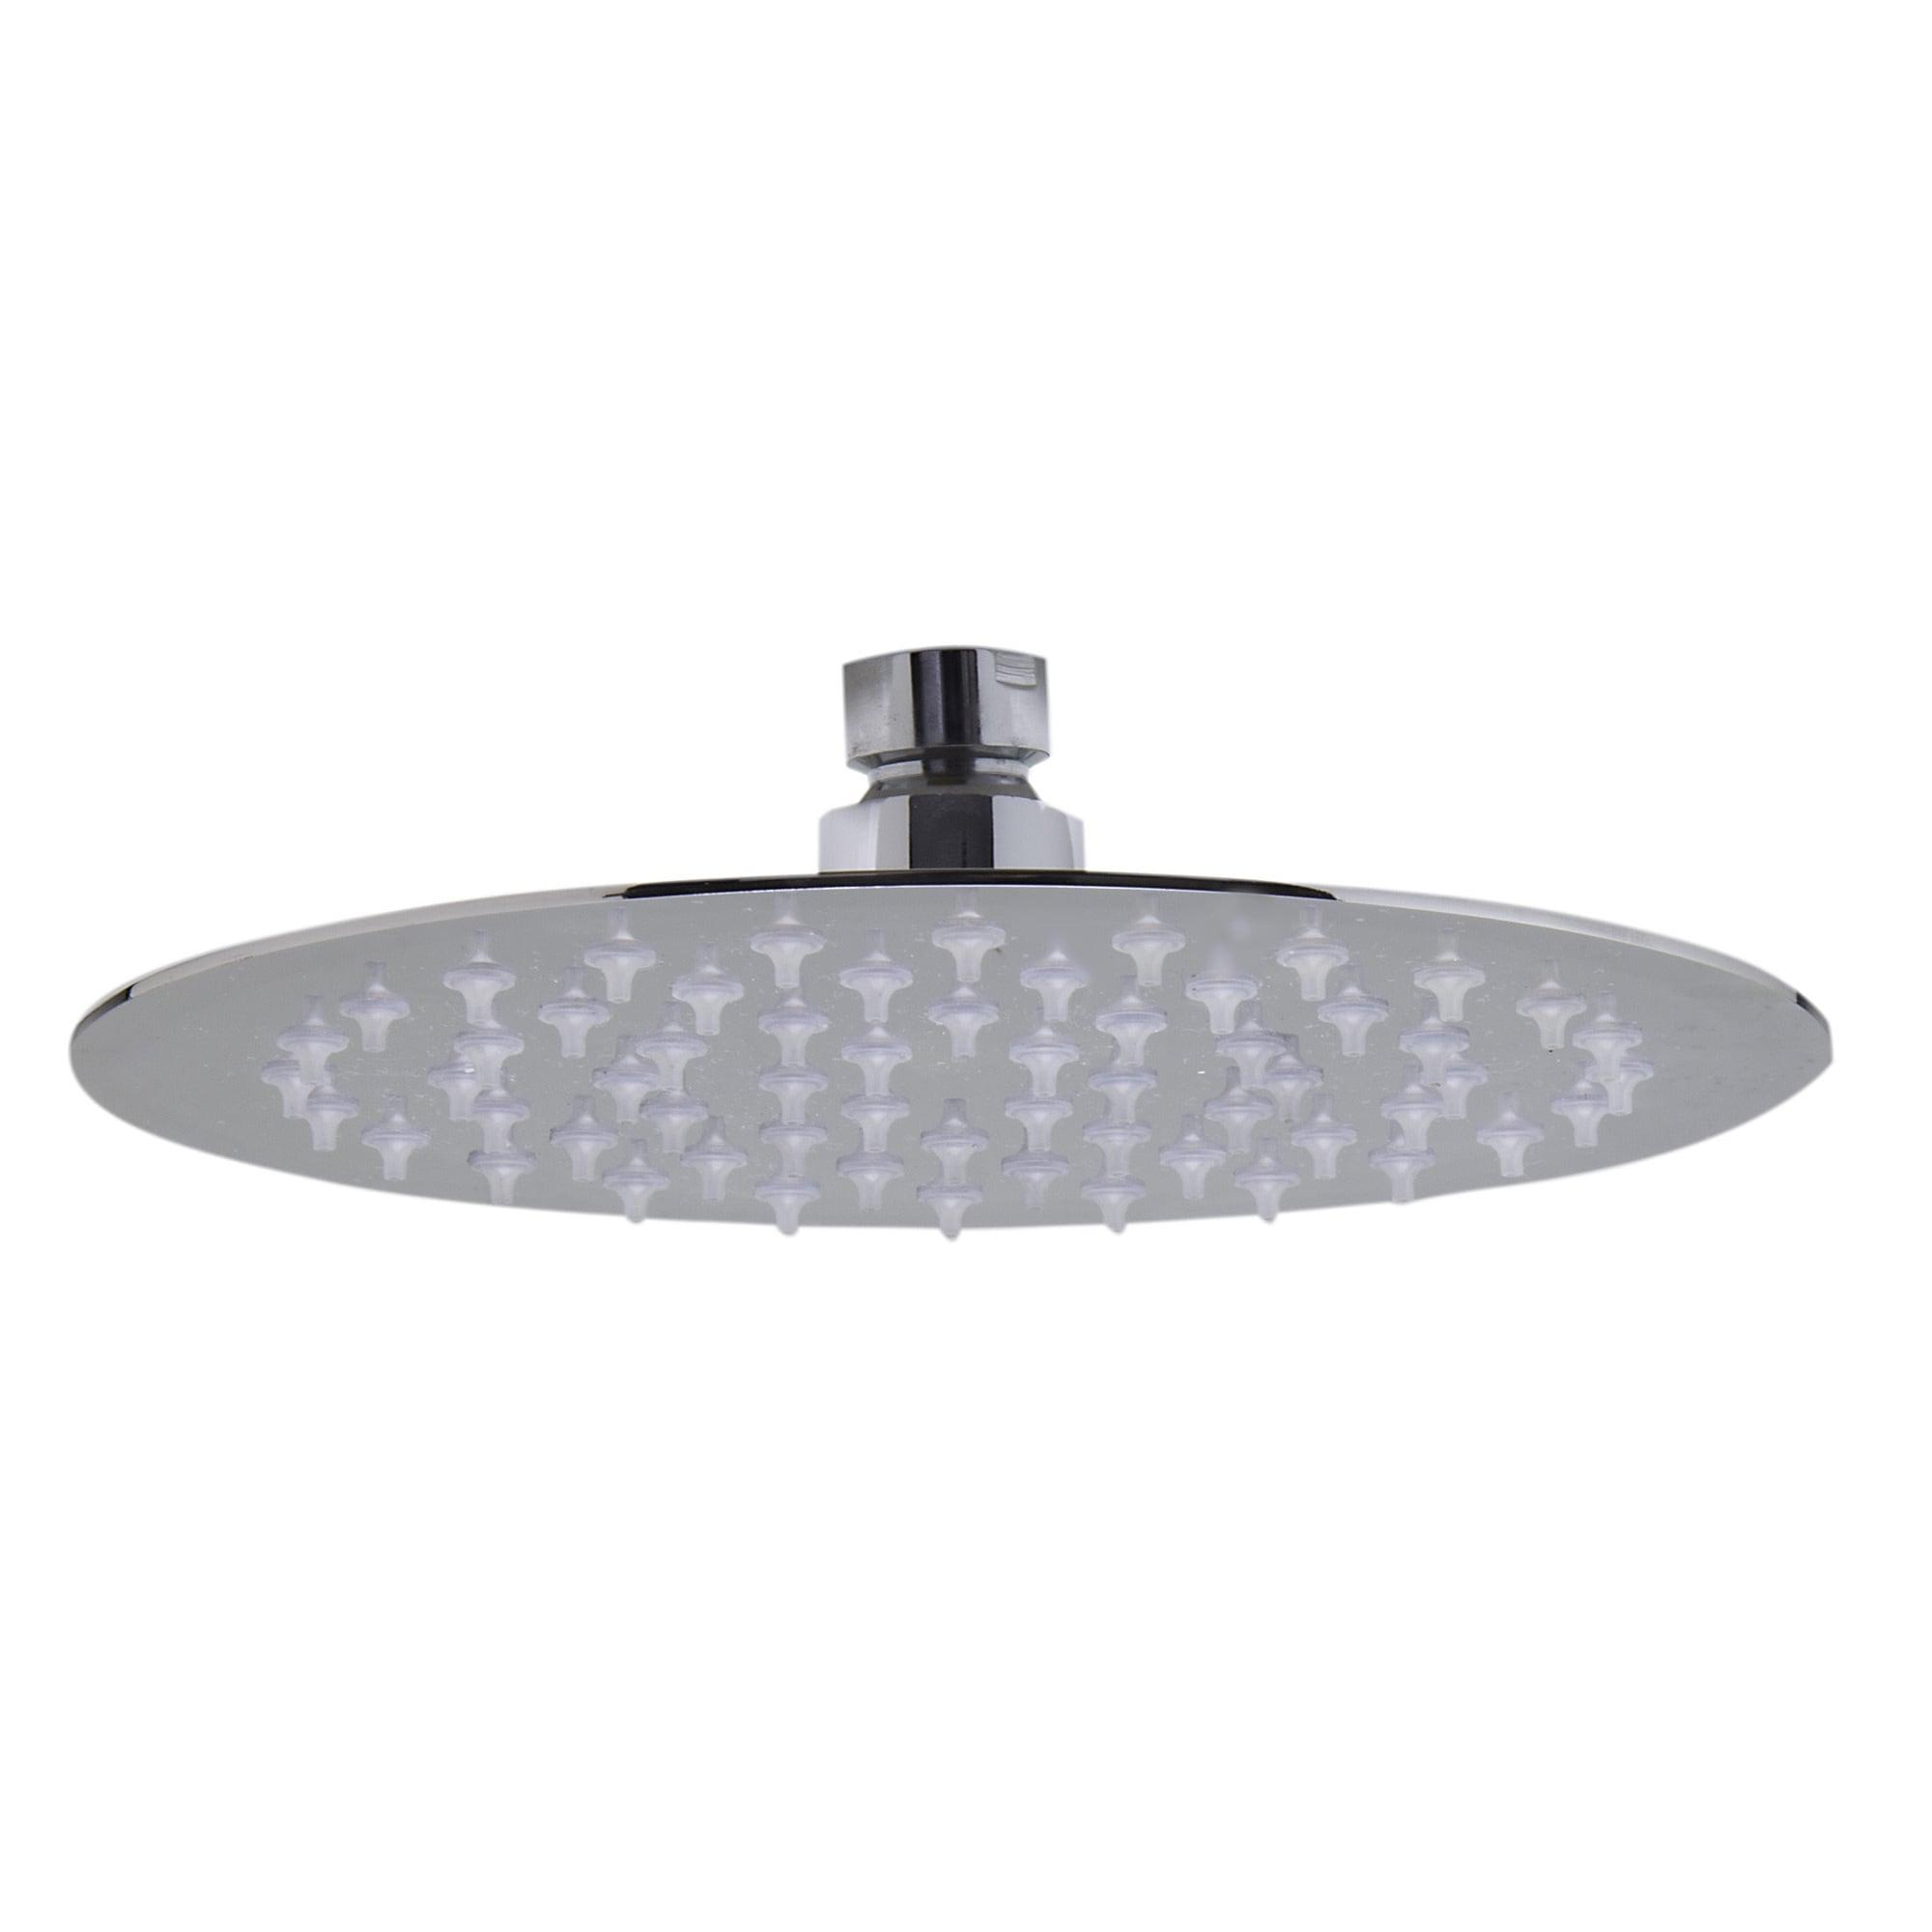 12inch Modern Shower Head Chrome Ultra Thin Top Ceiling Silver Overhead Rainfall